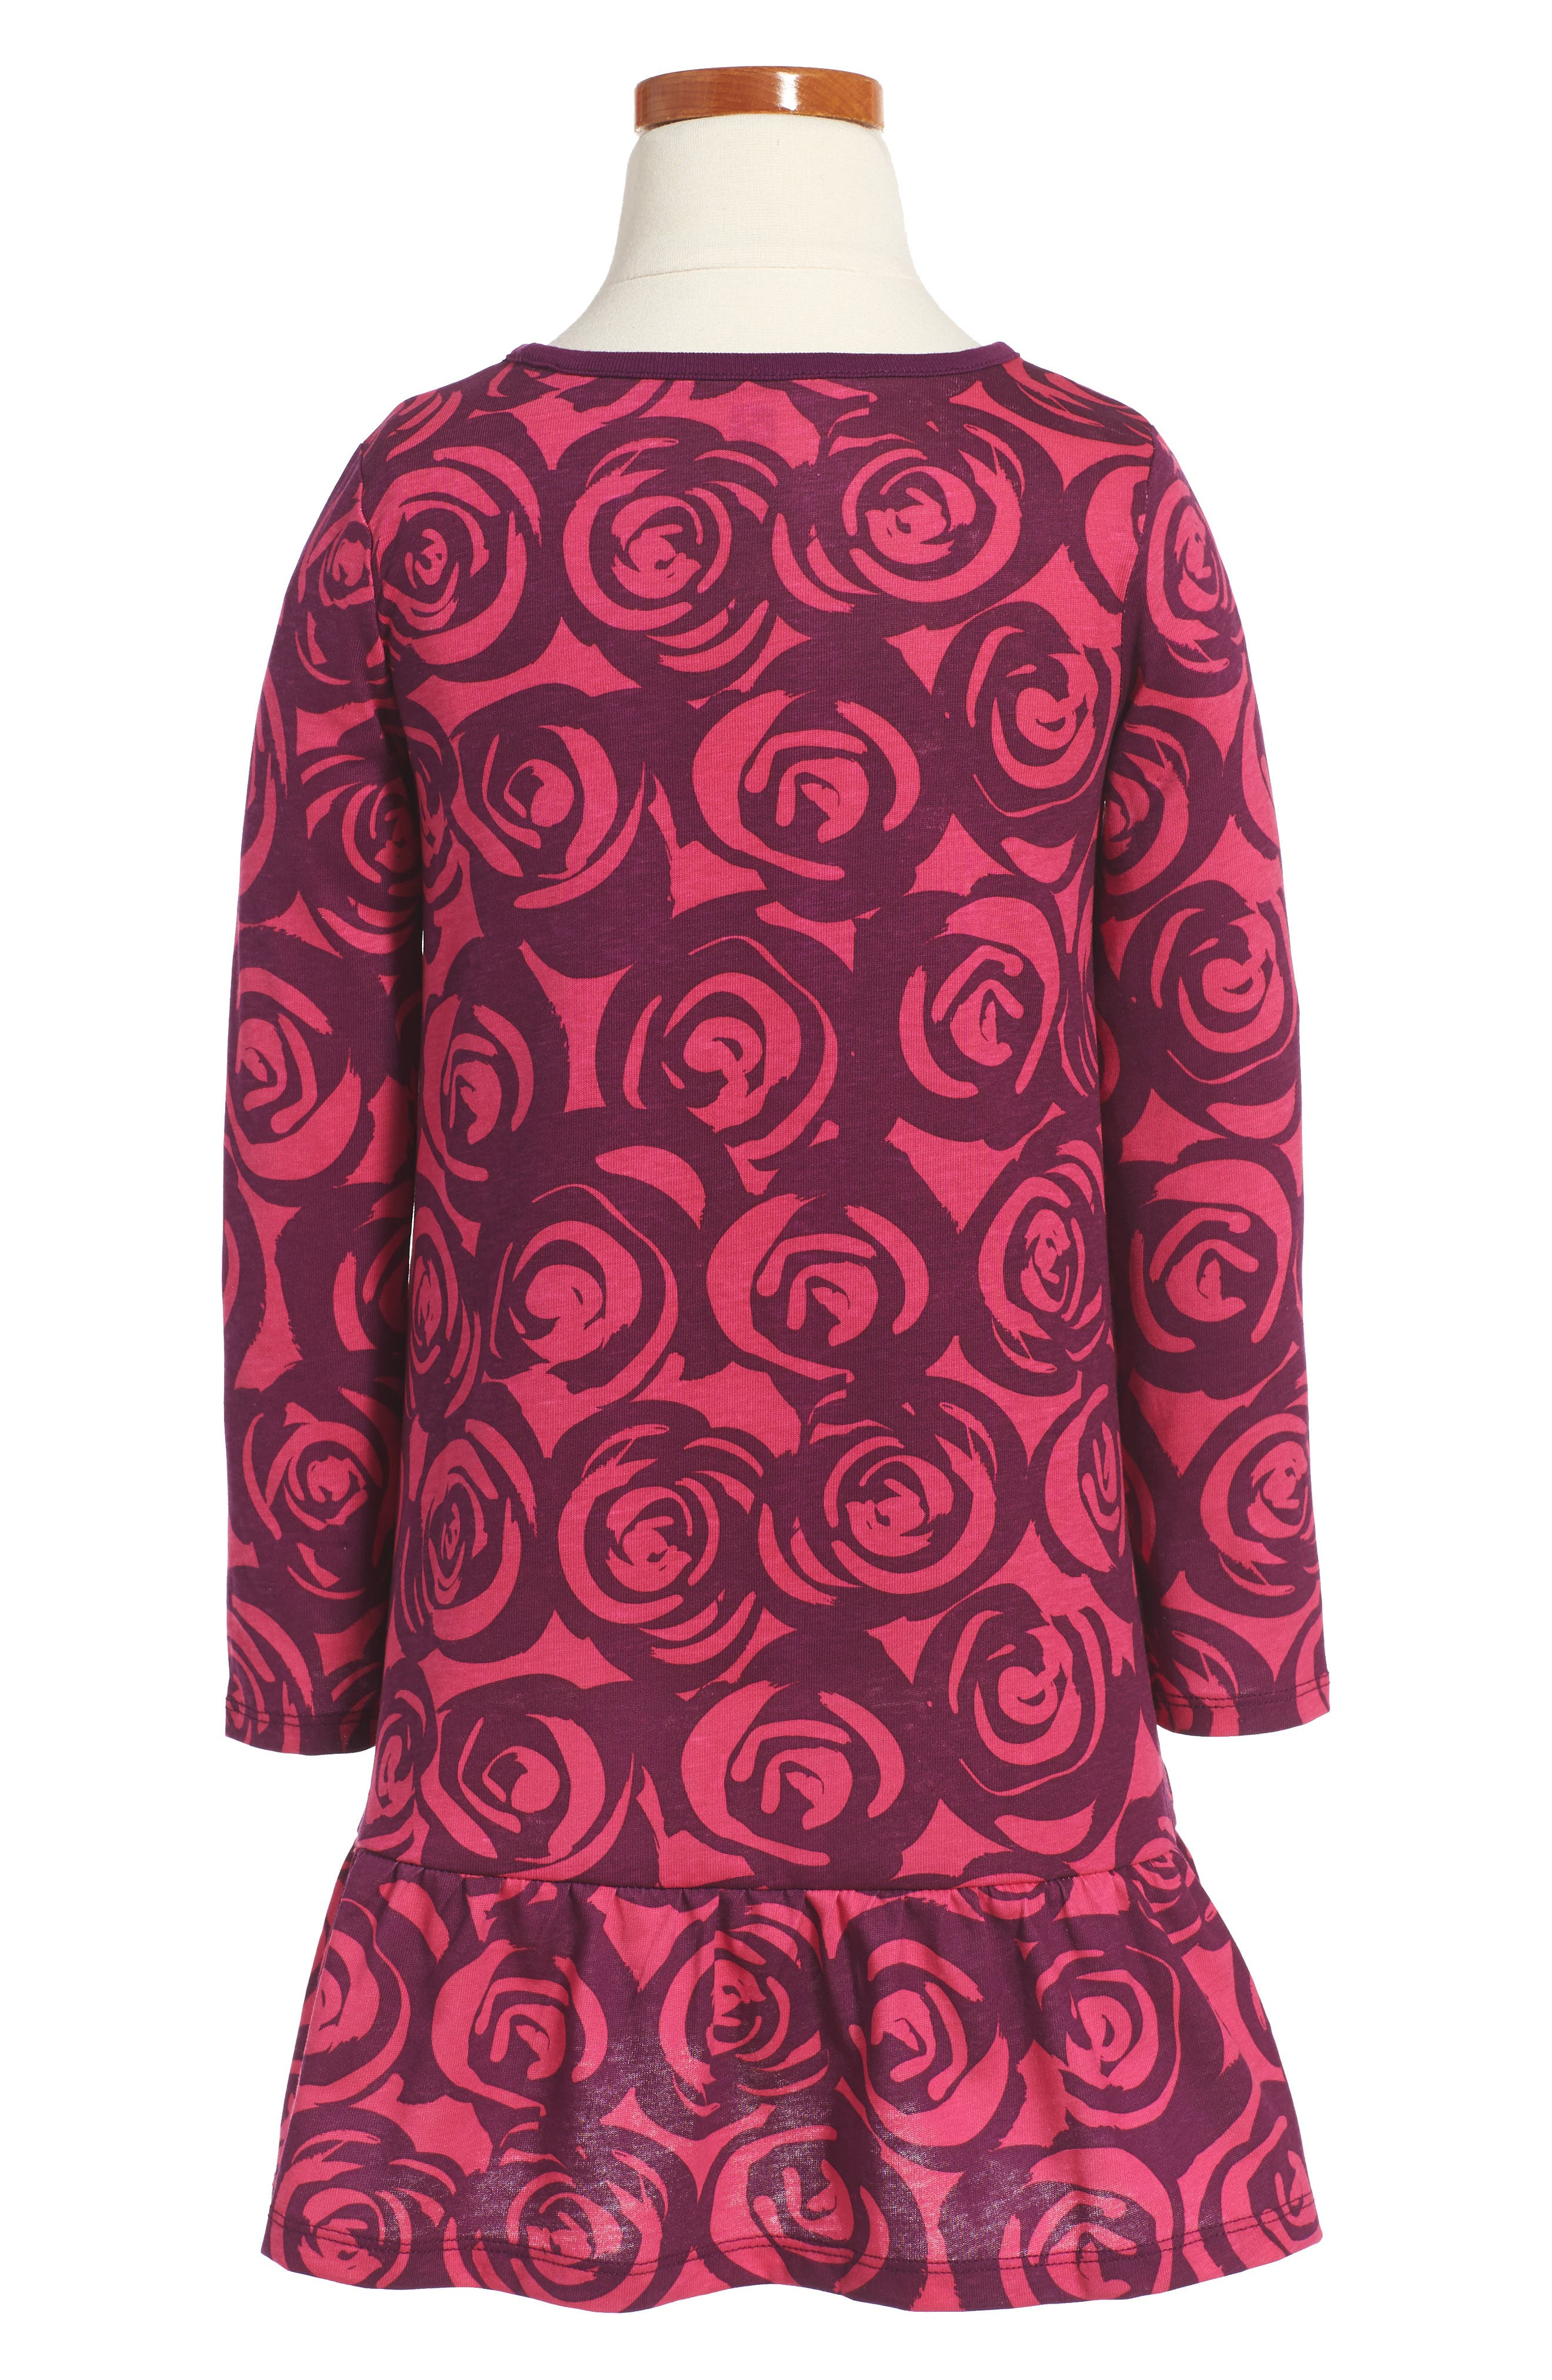 Rennie Rose Ruffle Dress,                             Alternate thumbnail 2, color,                             651